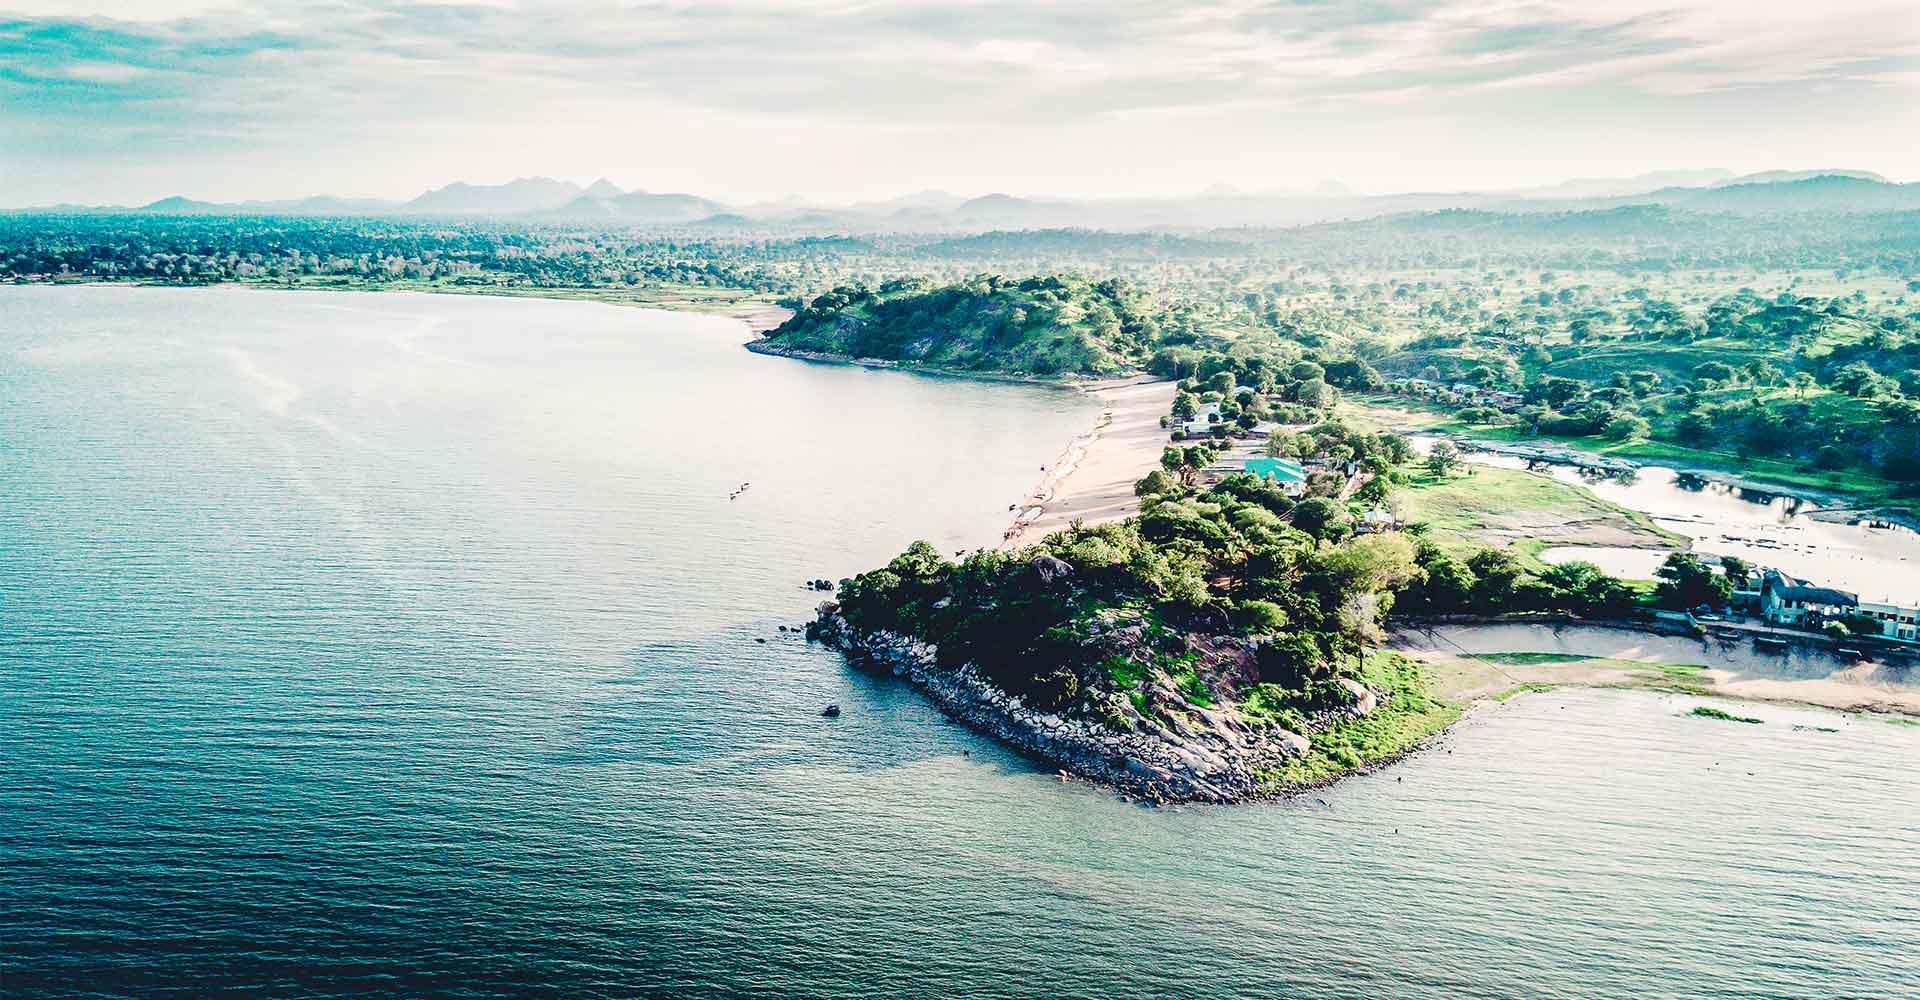 Banner image of Malawi